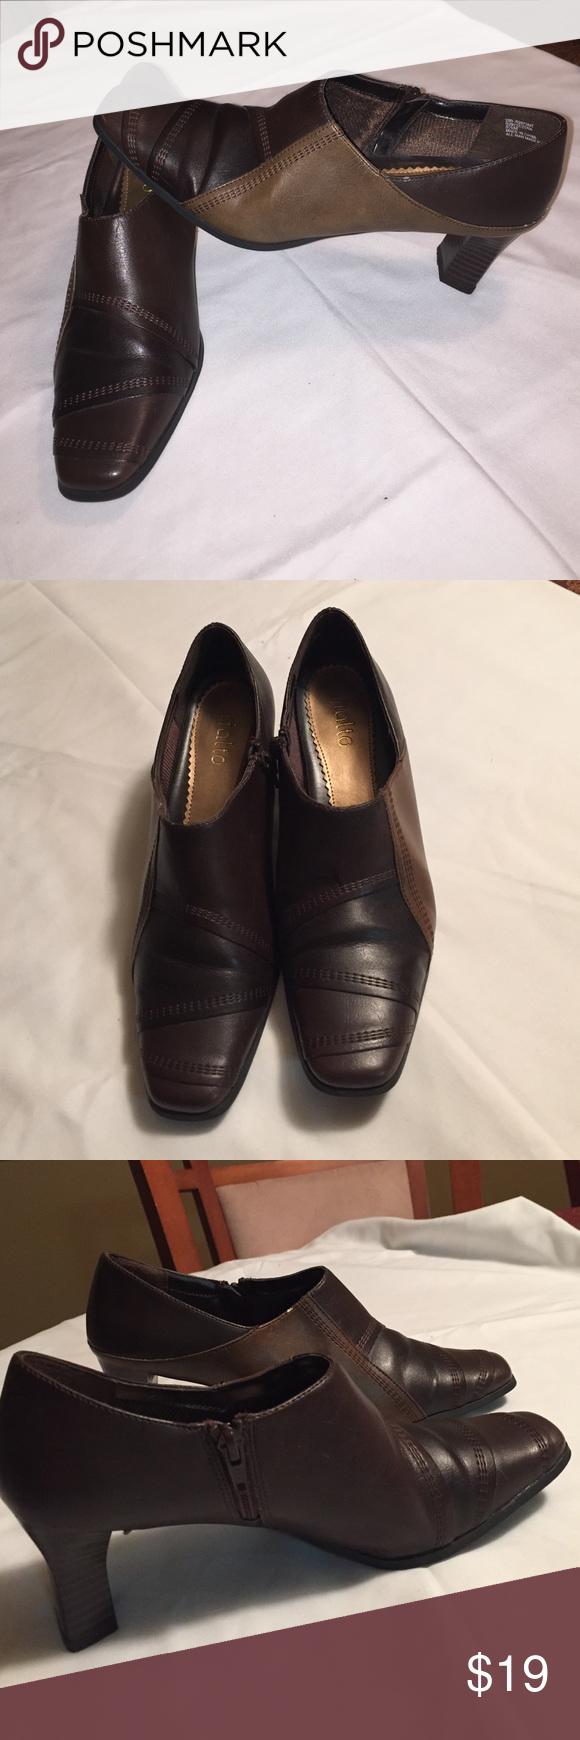 Womenus dress shoes brown dress shoes dress shoes and dark brown